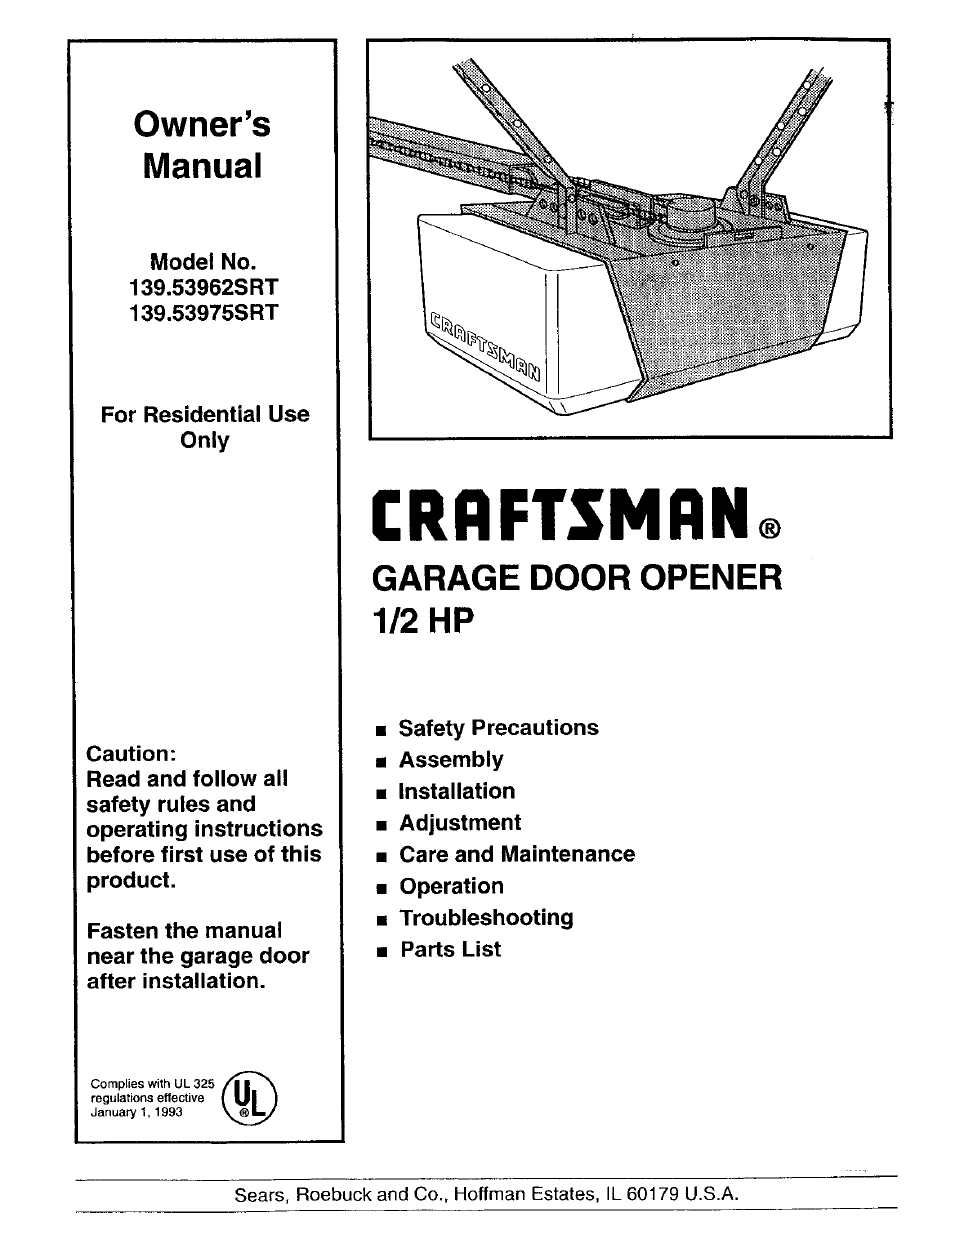 hight resolution of craftsman 139 53975srt user manual 40 pages also for 139 53962 srt genie garage door